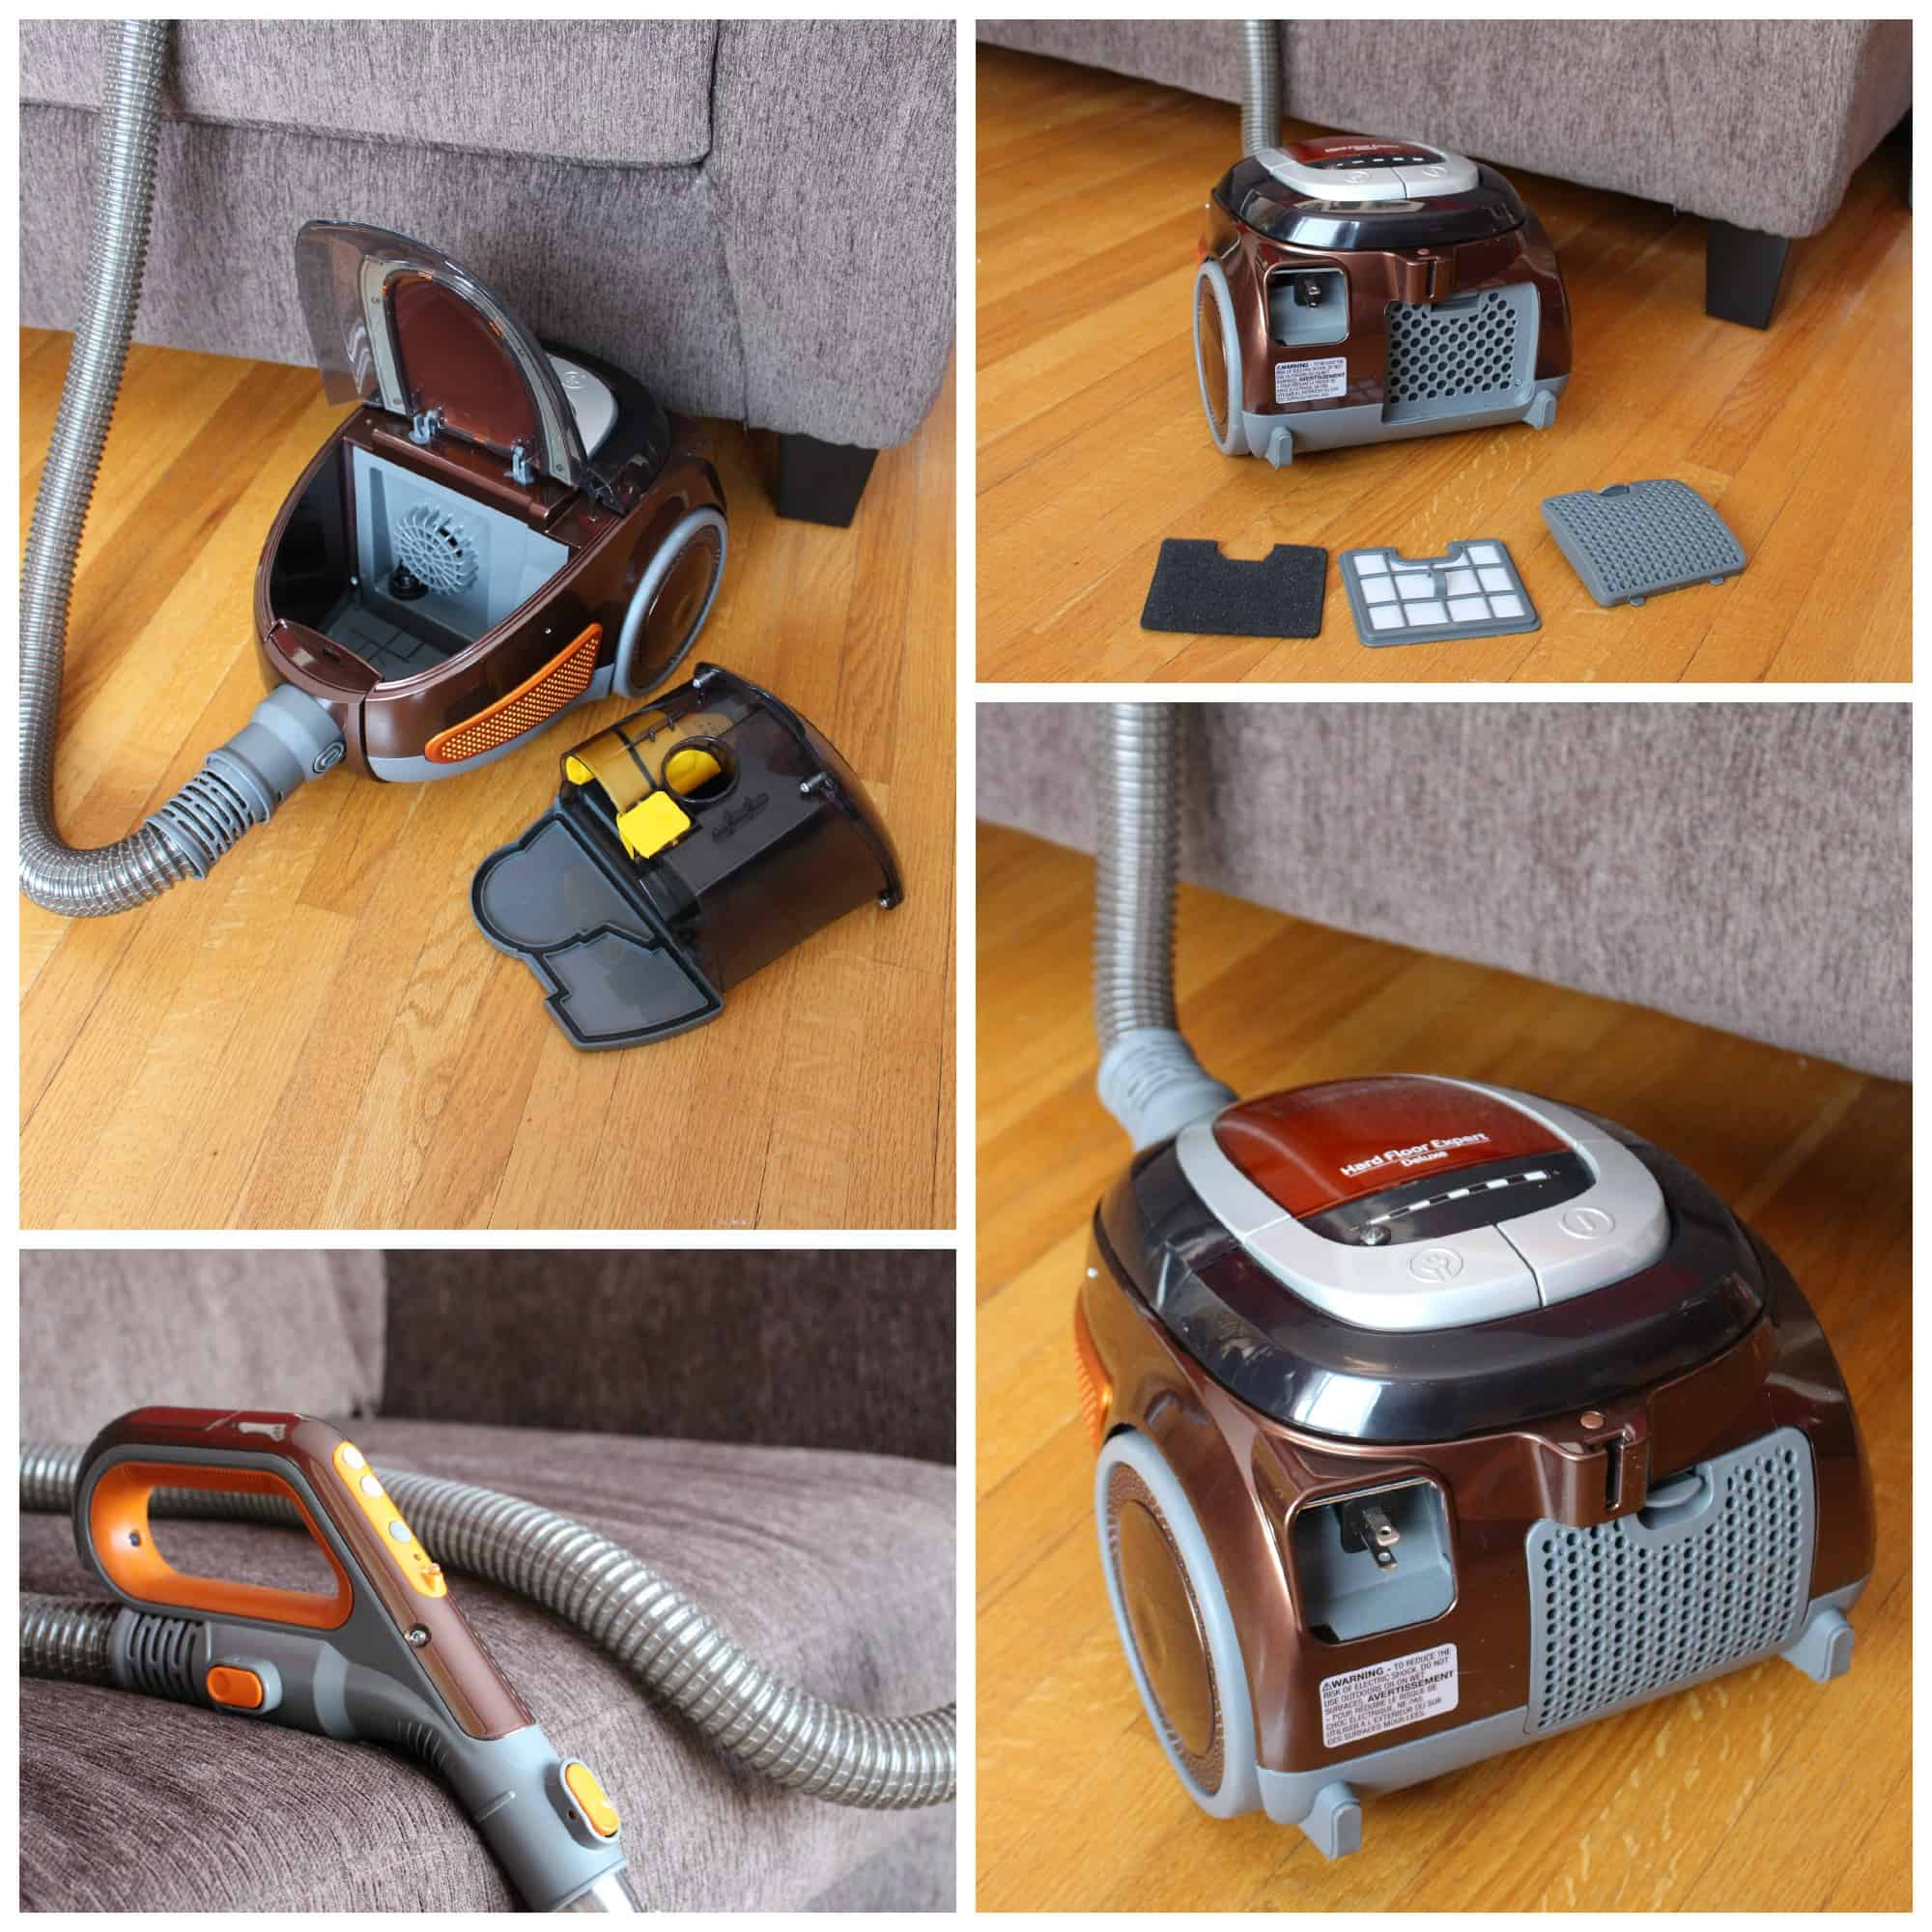 Canister vacuums for hardwood floors floor matttroy for Wood floor vacuum cleaner